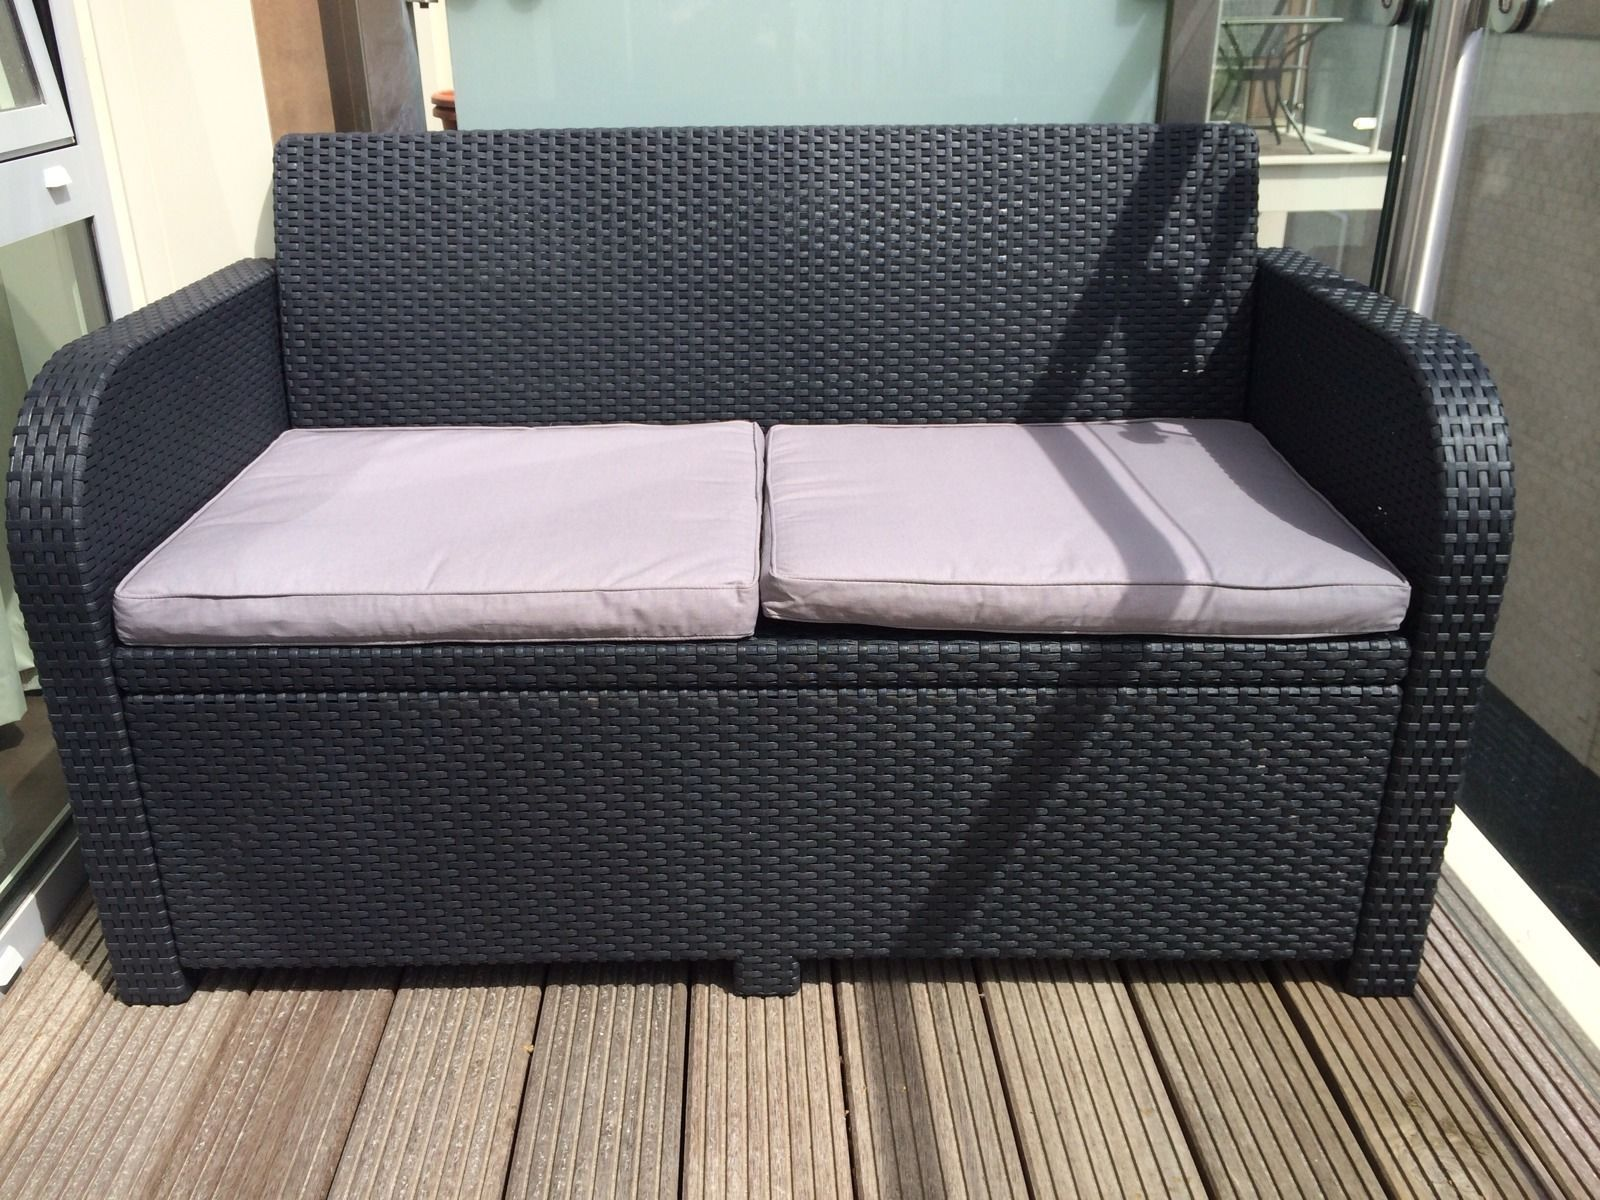 Rattan Garden Balcony Patio Furniture Bench eBay (With